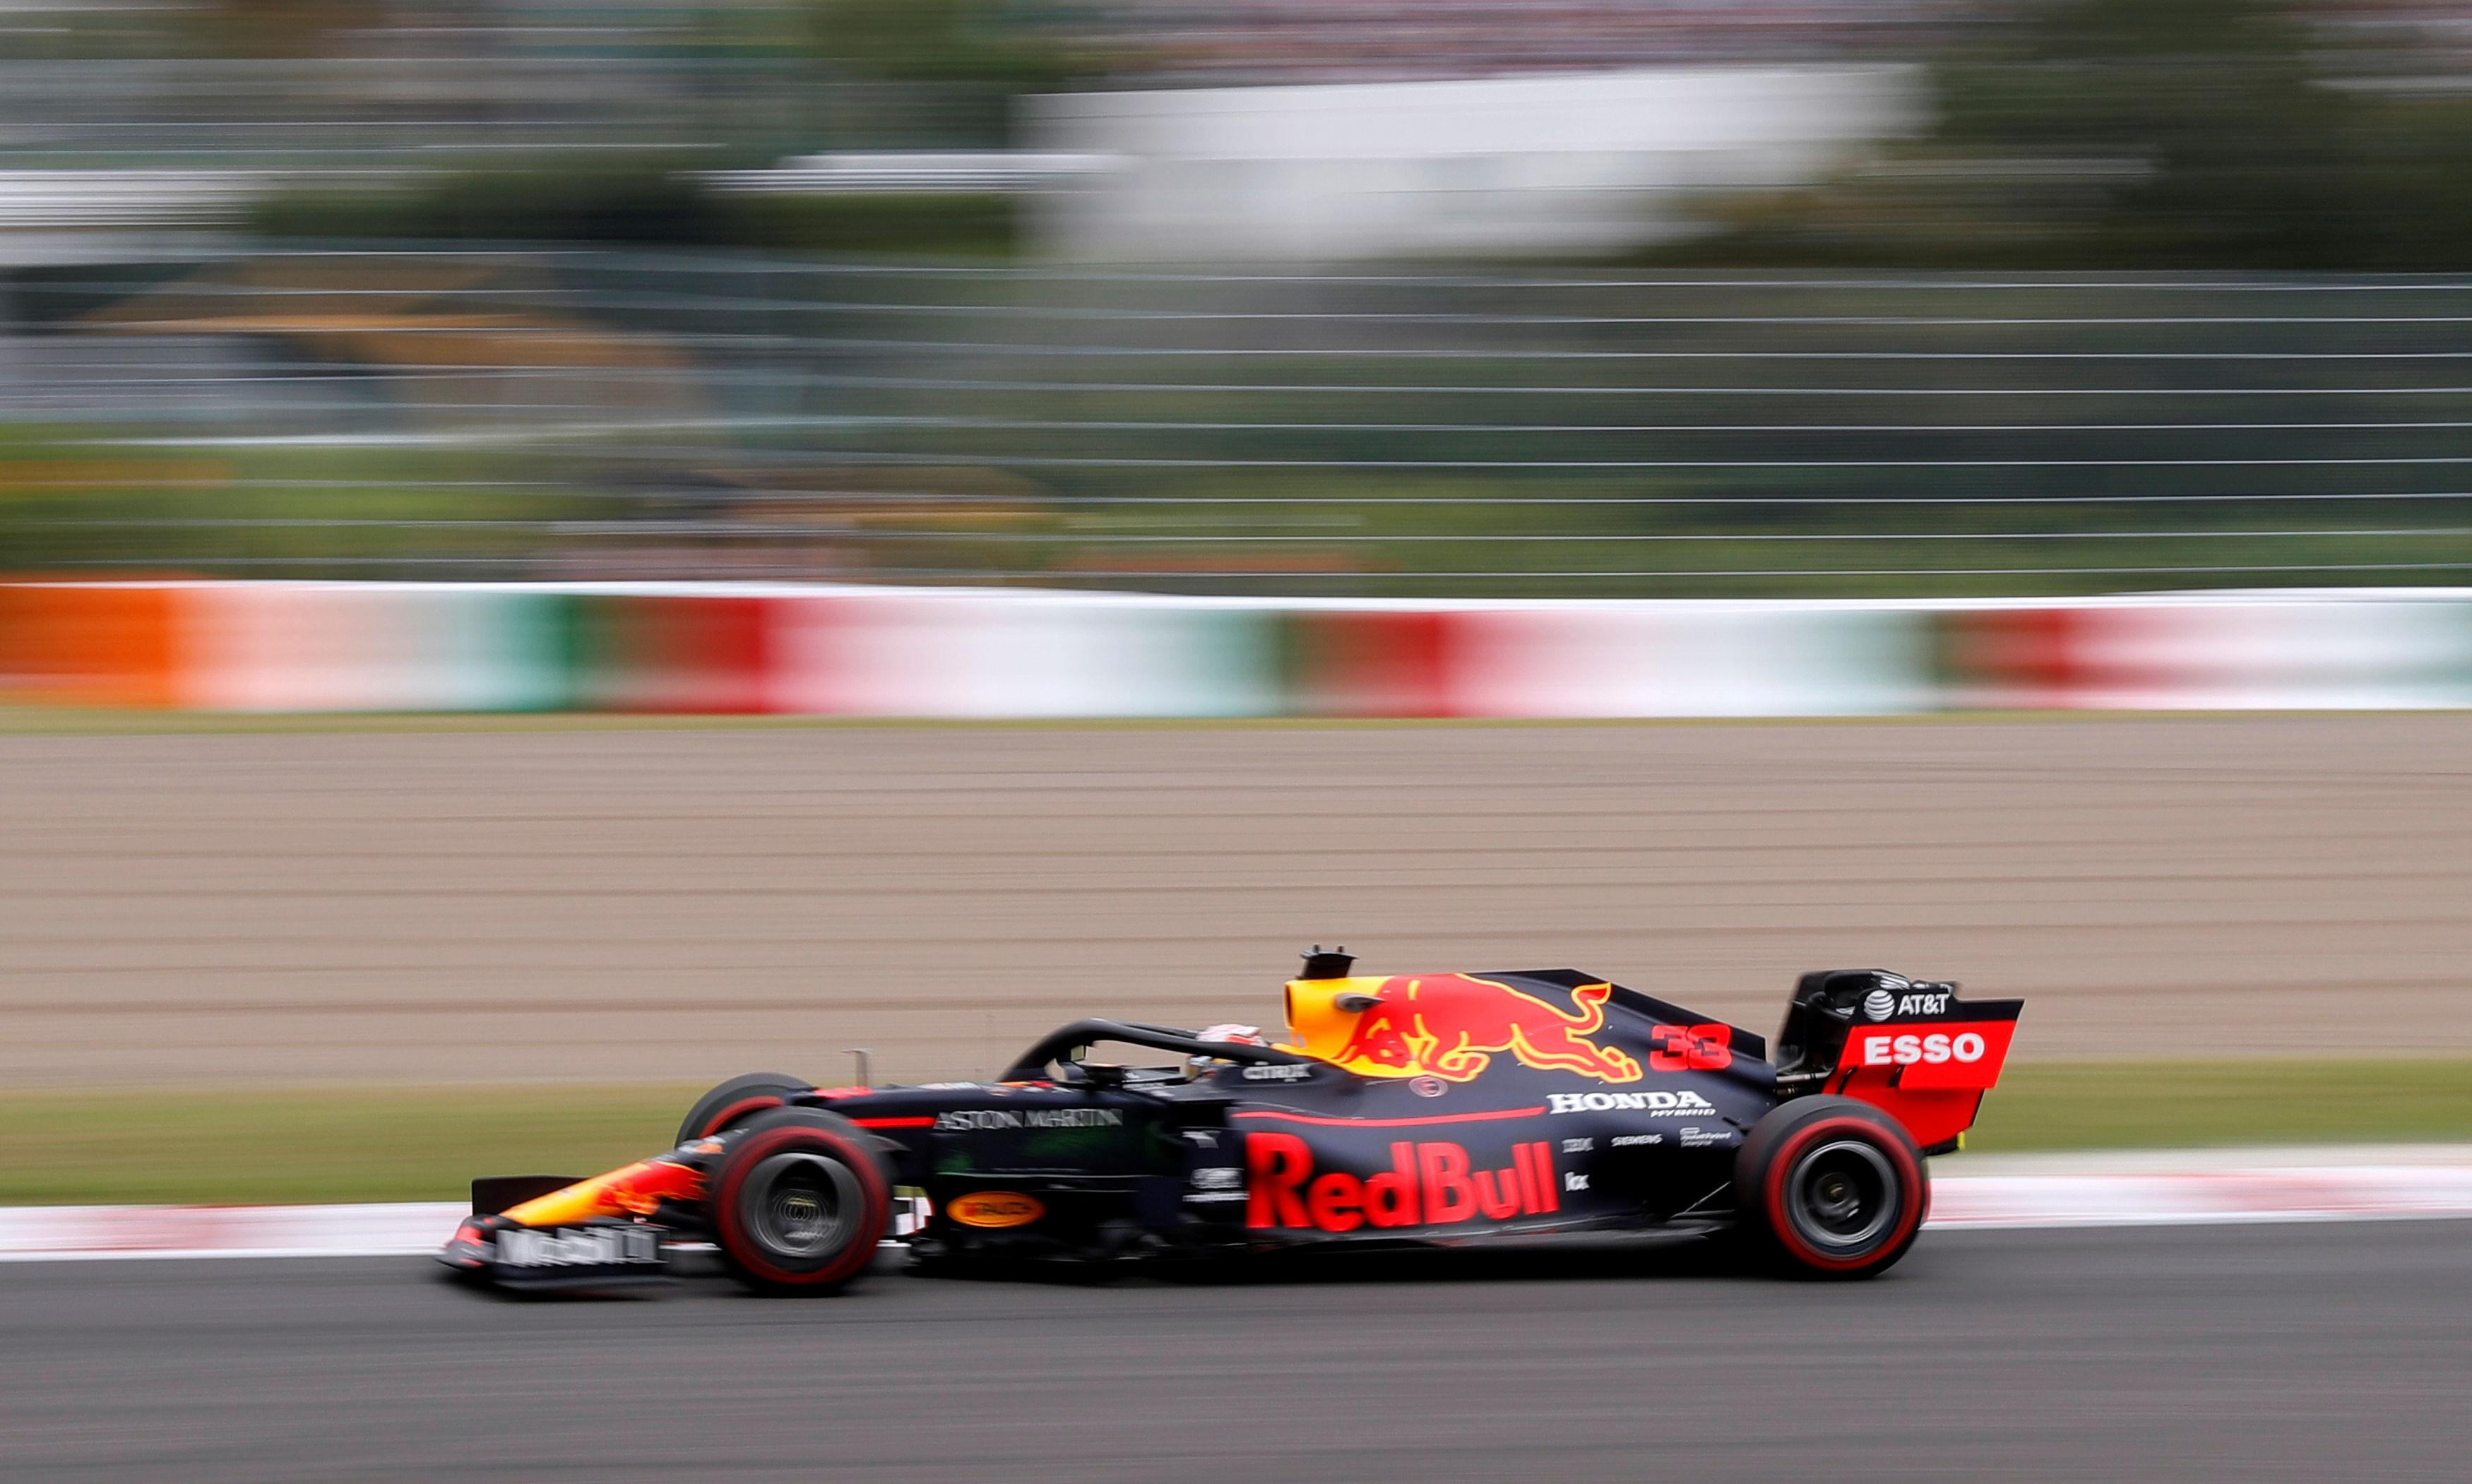 Formula One cancels all Saturday running as Typhoon Hagibis looms at Japan GP